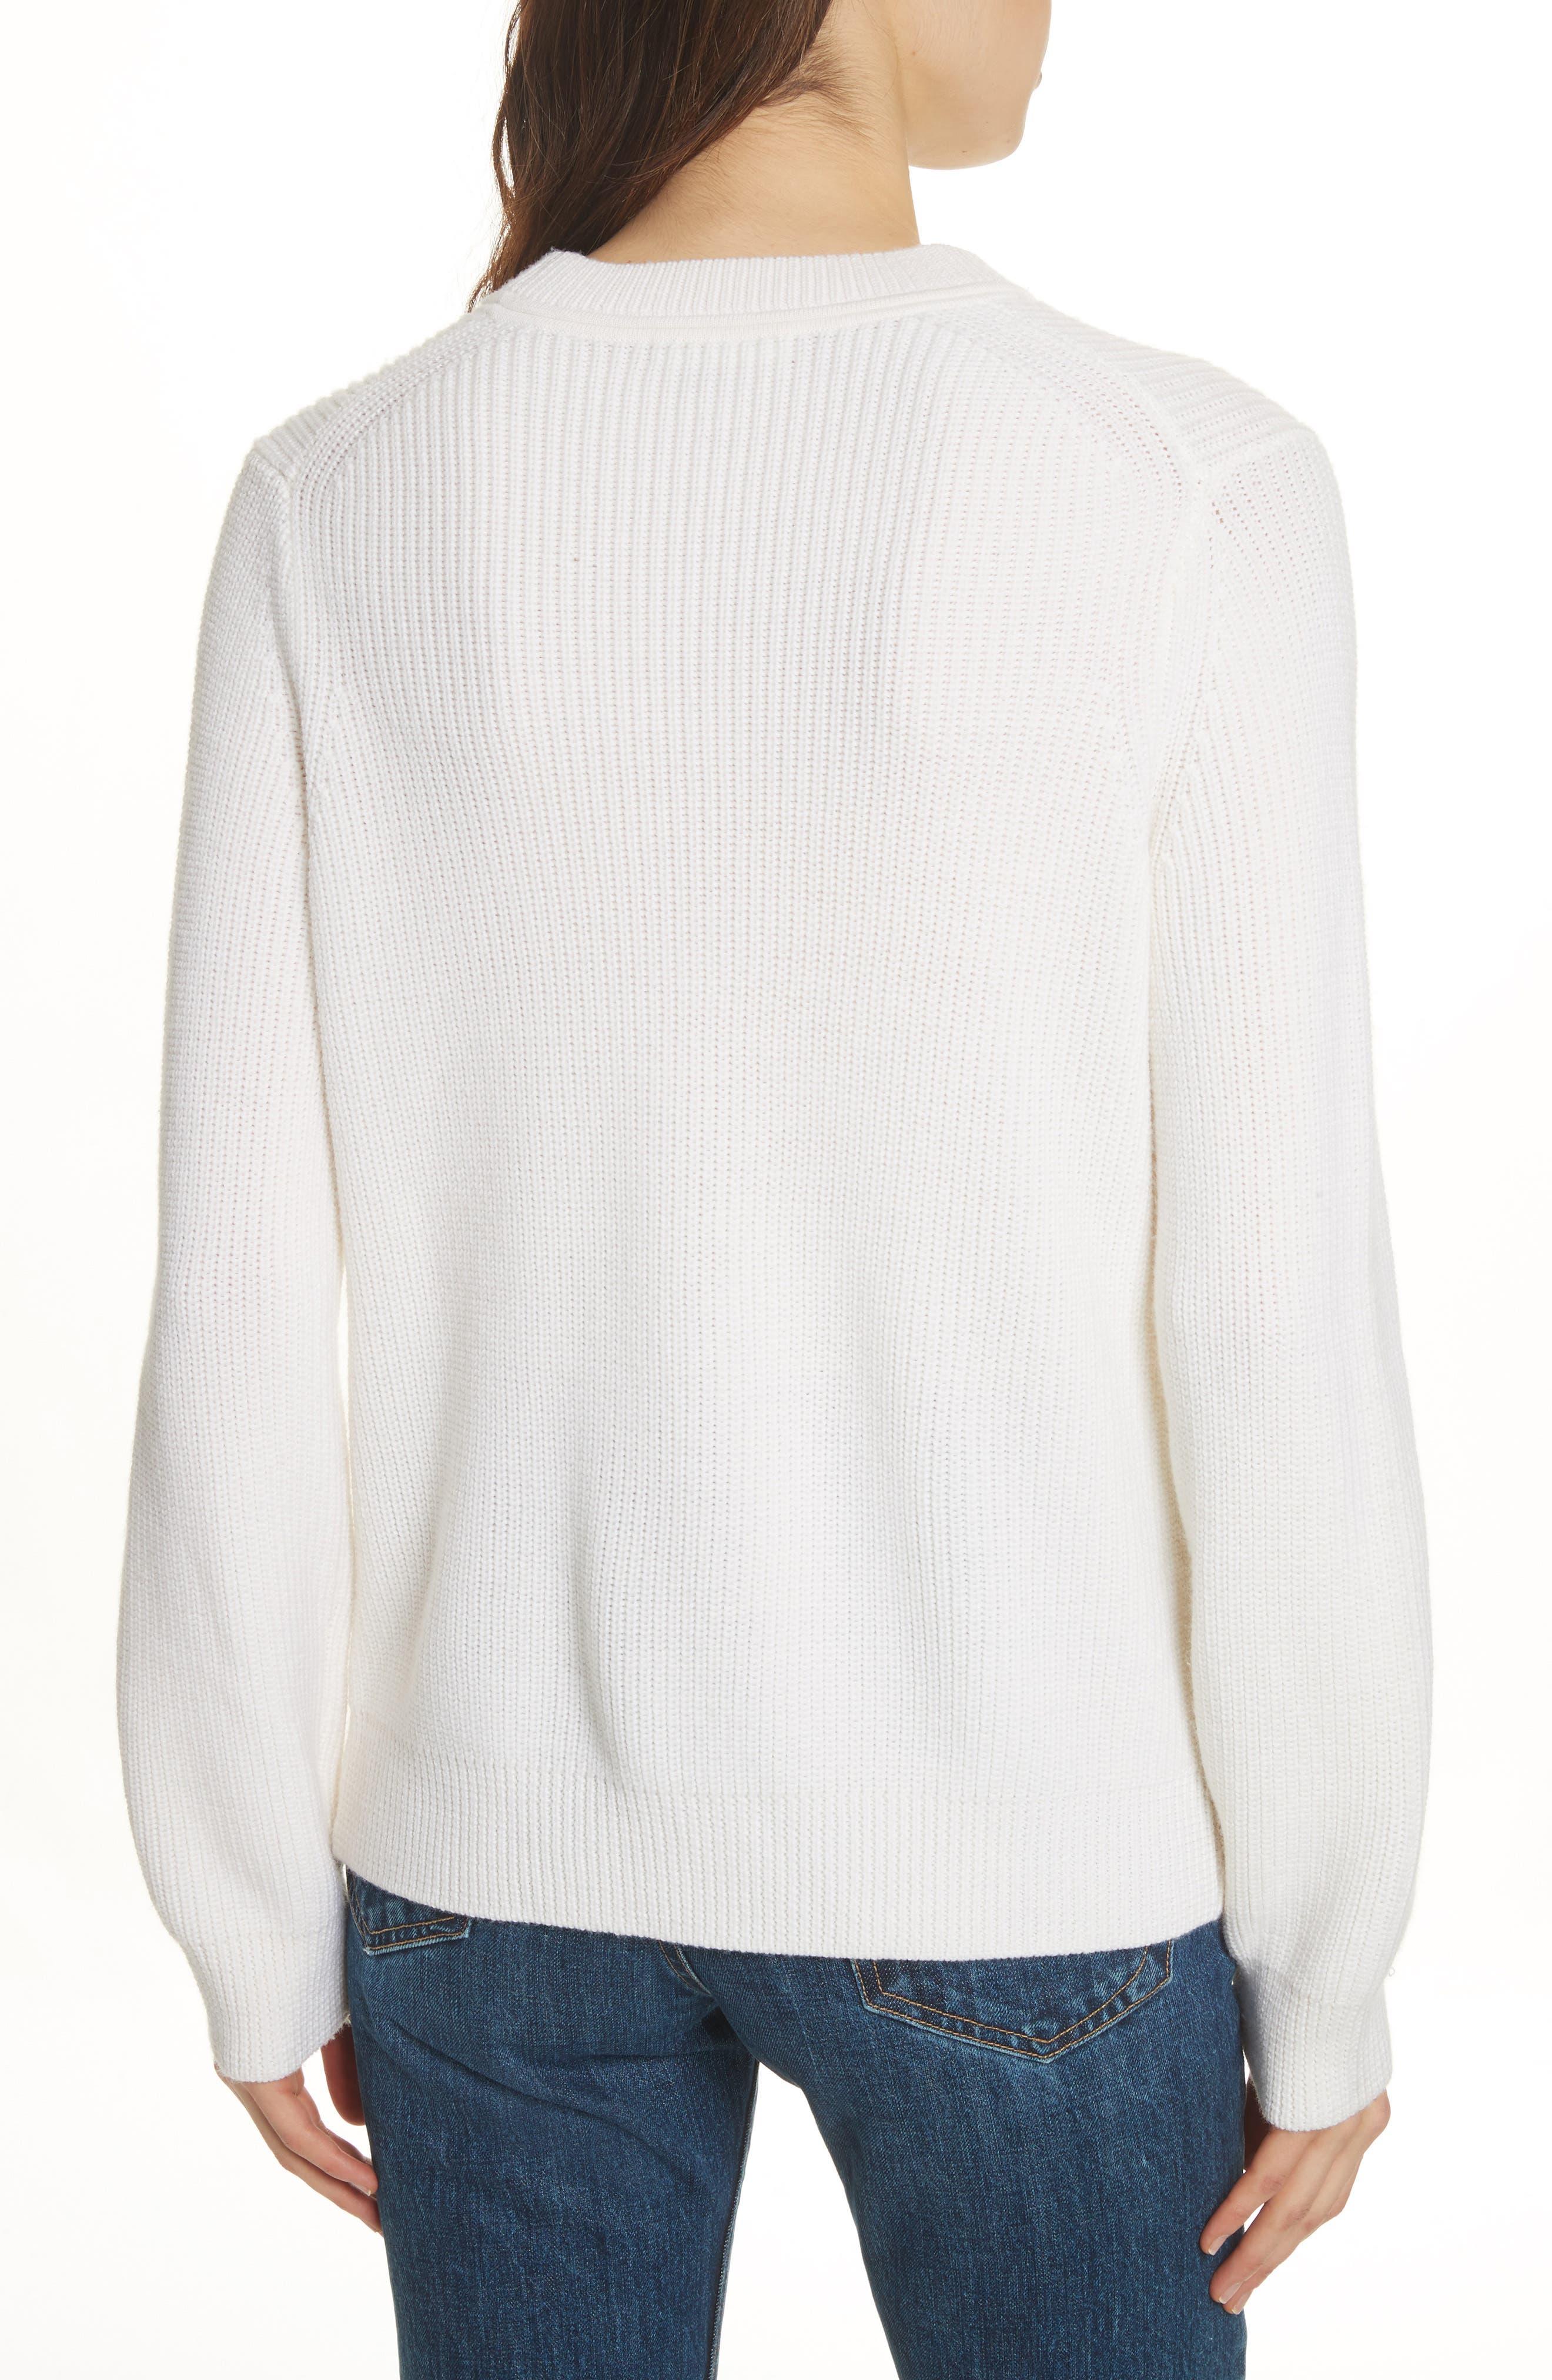 Tori Cutout Sweatshirt,                             Alternate thumbnail 2, color,                             Ivory